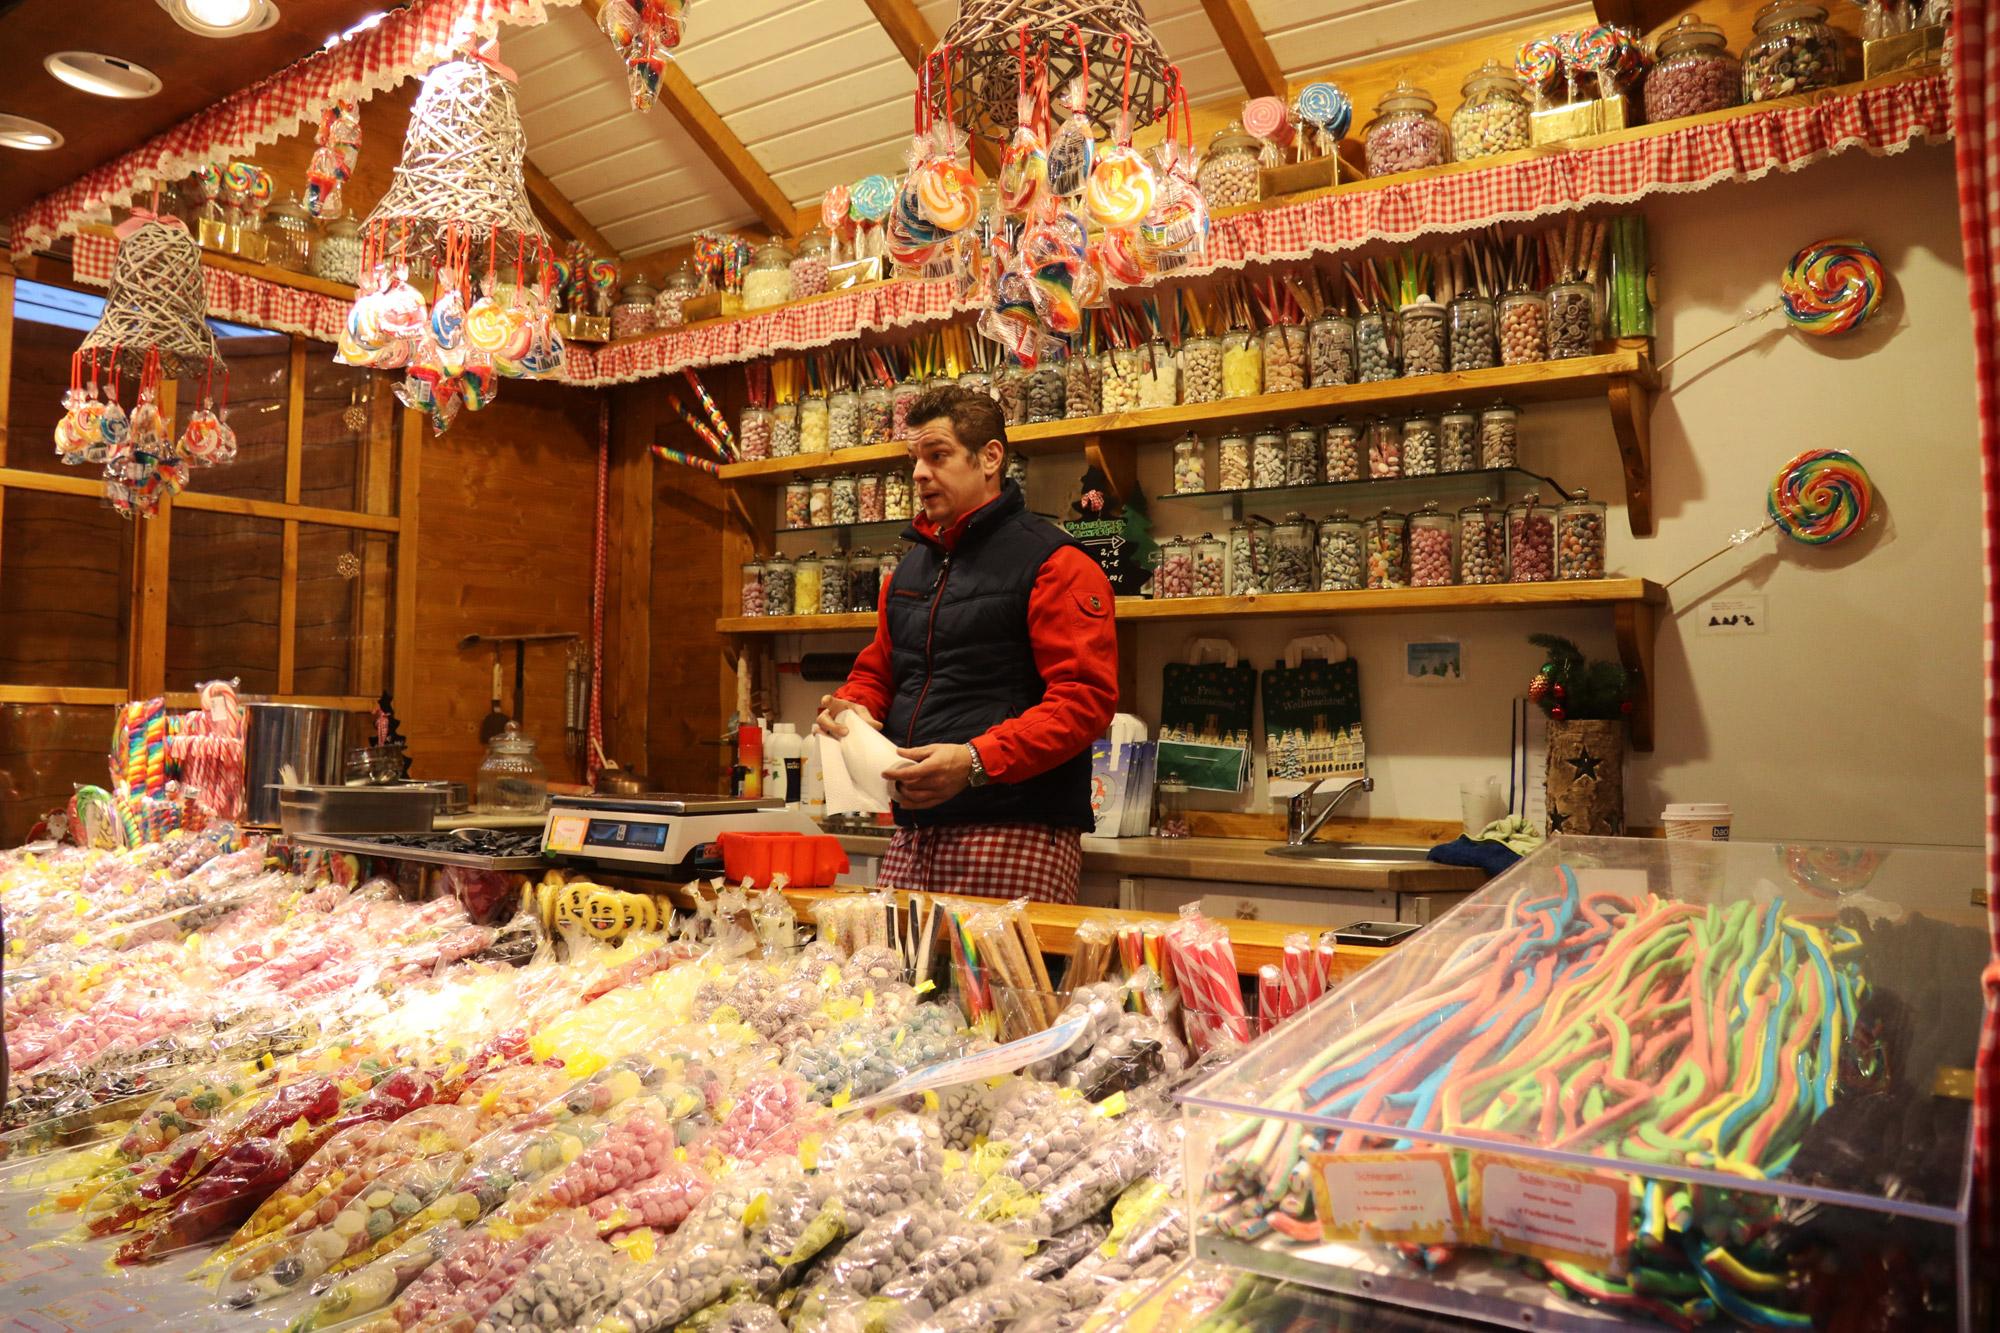 Münster kerstmarkt - Snoepgoed